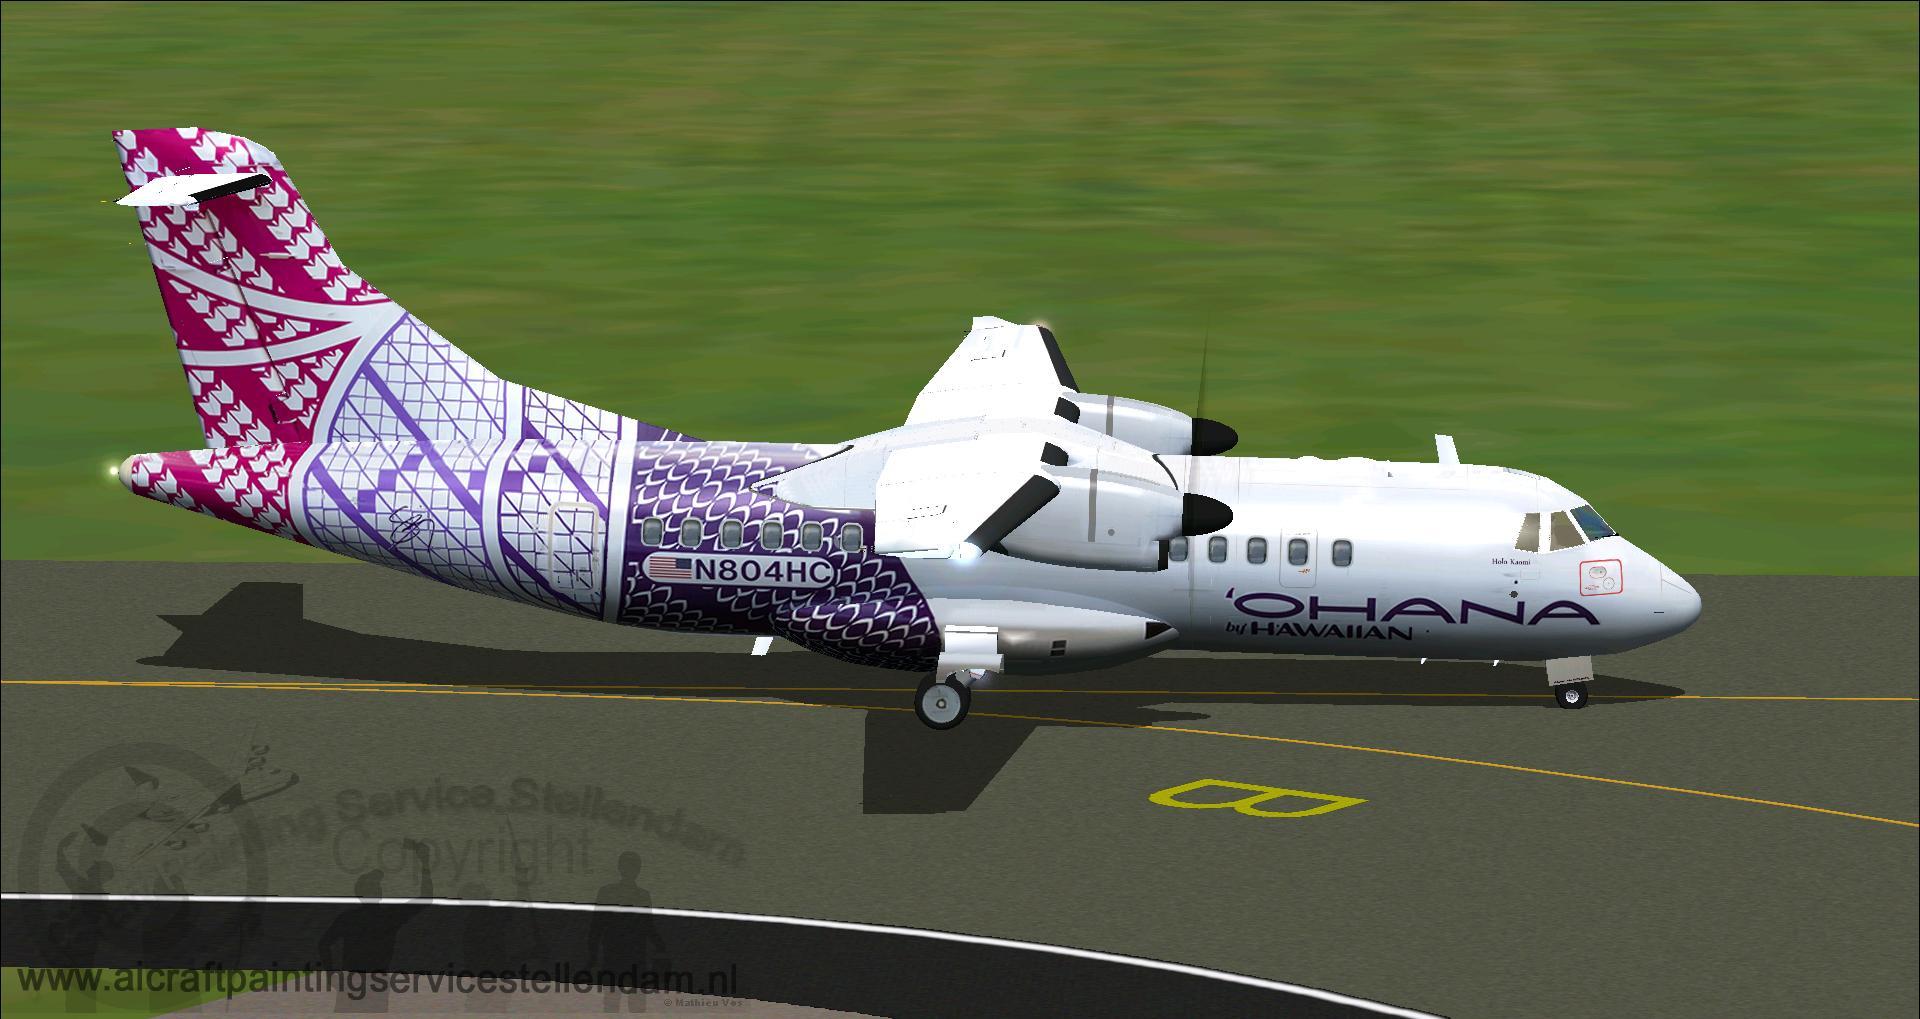 ISDT_ATR42-500_Ohana_by_Hawaiian_N804HC